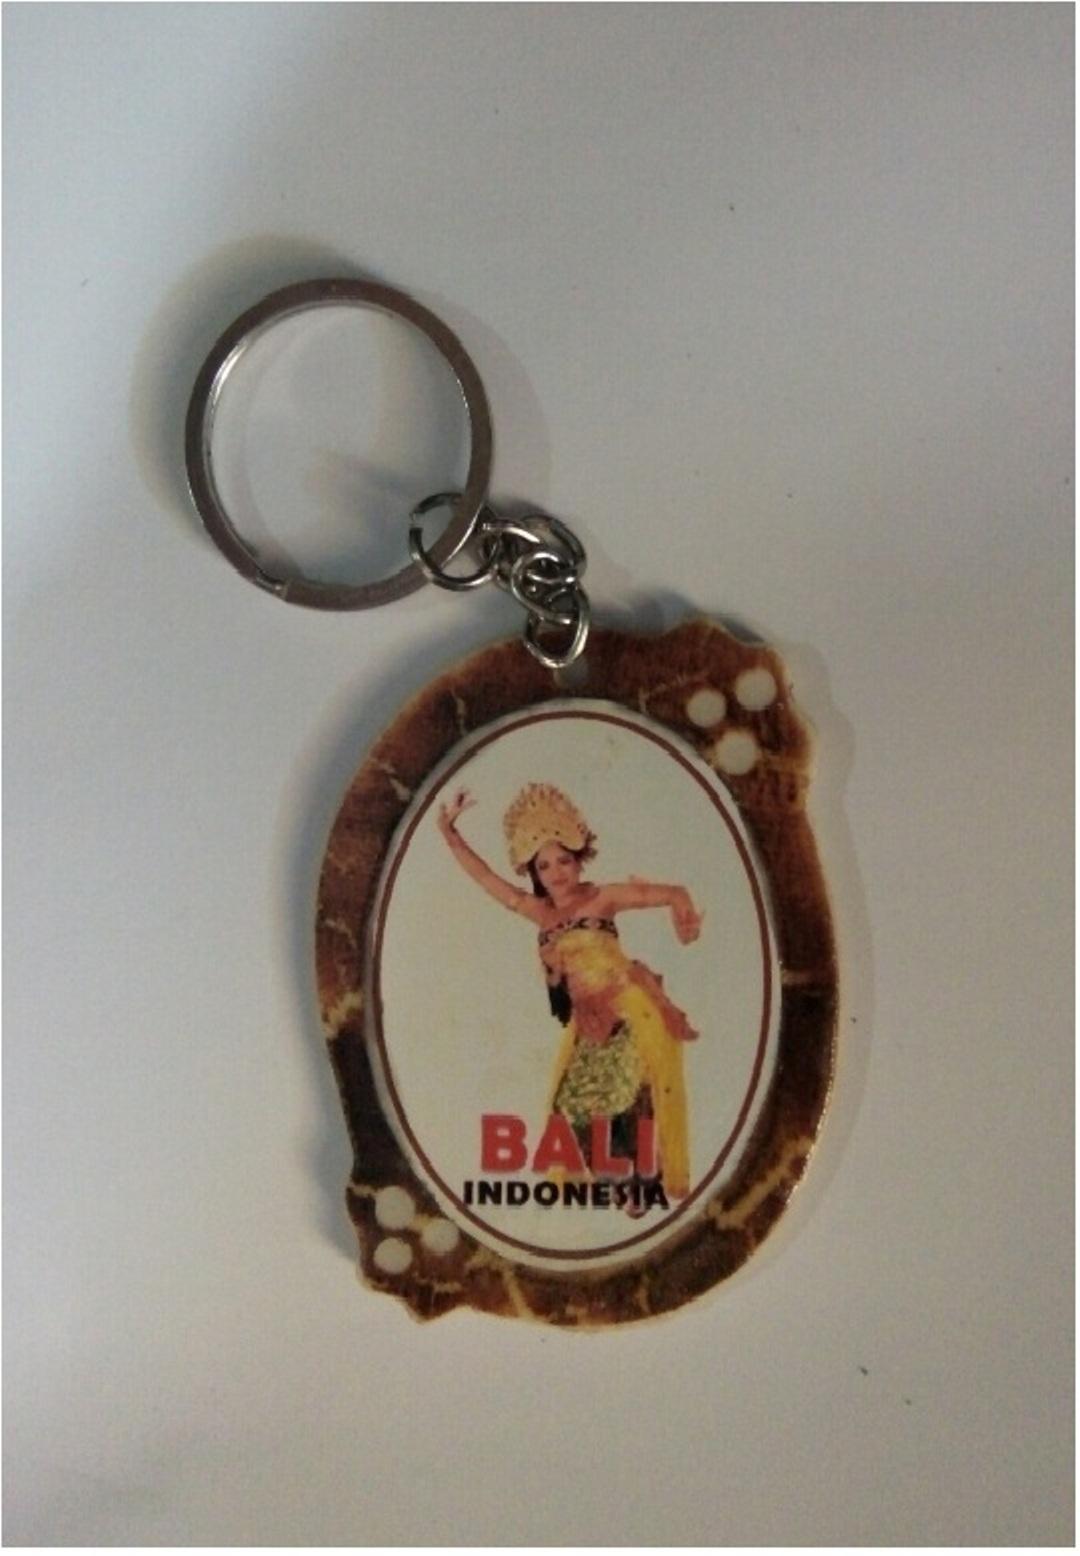 Gantungan Kunci Paralon Bakar Bali Menari, Design & Craft, Handmade Goods & Accessories on Carousell